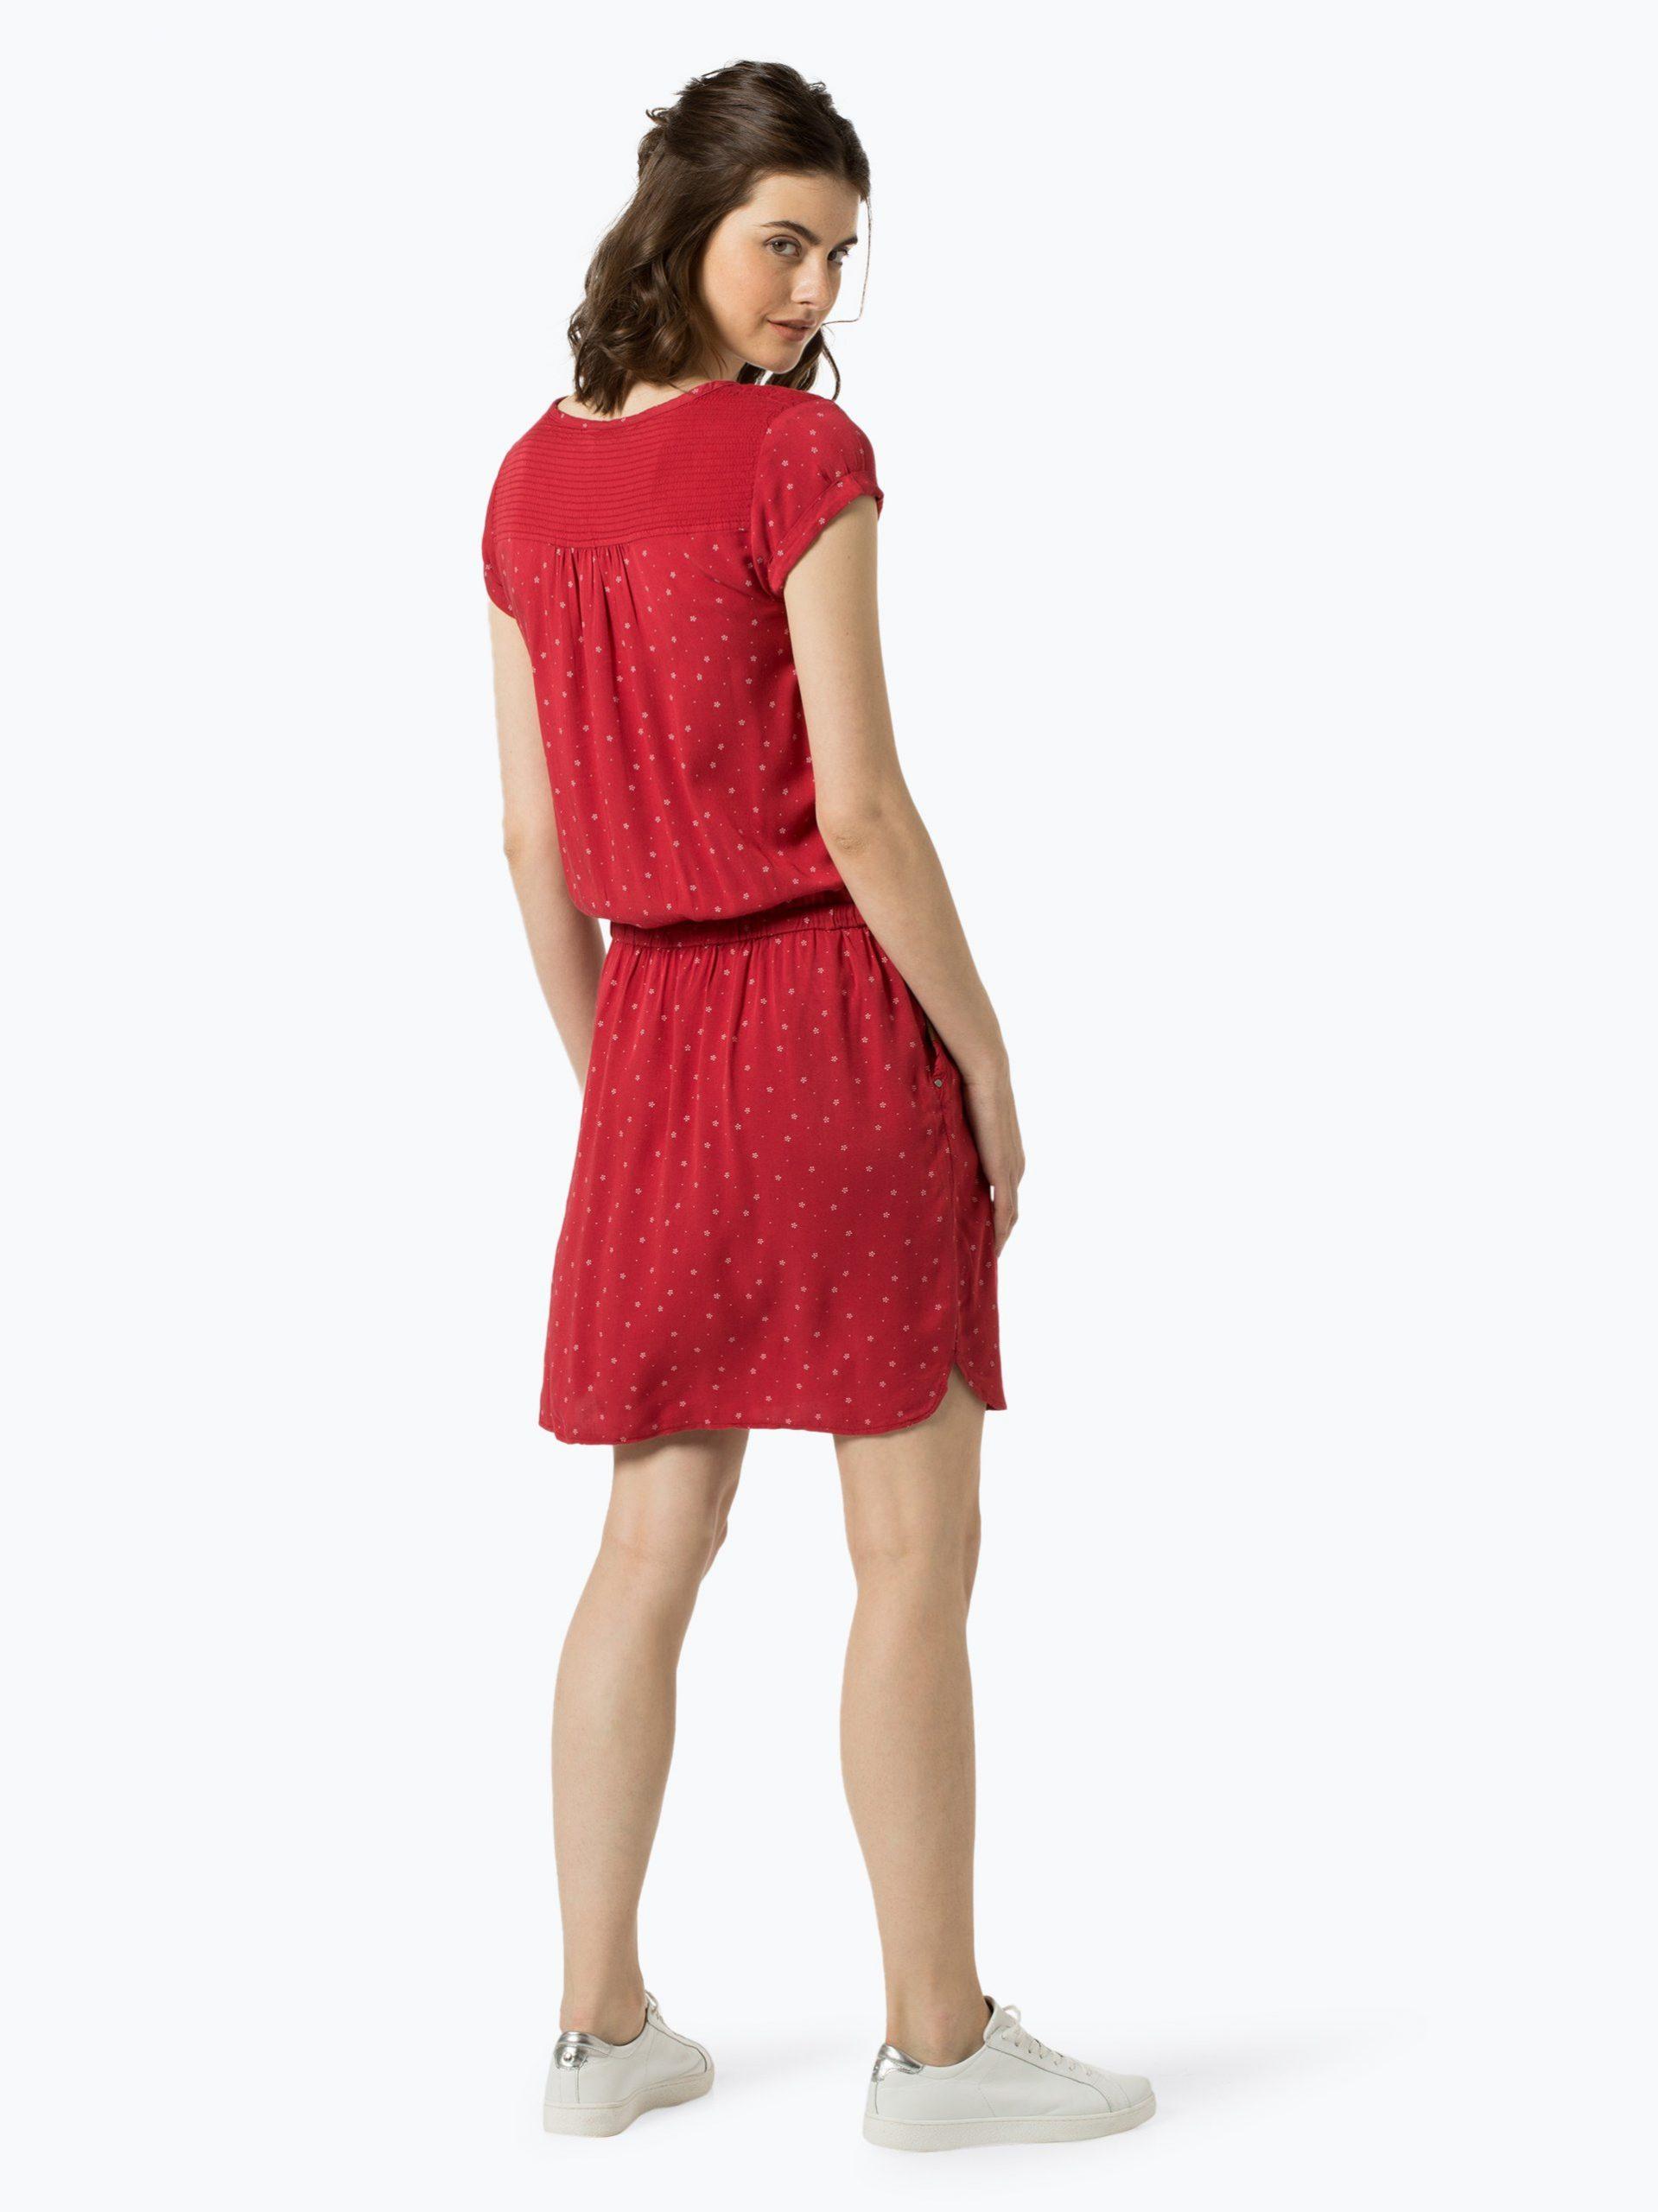 Ragwear Damen Kleid  Danila Online Kaufen  Vangraaf